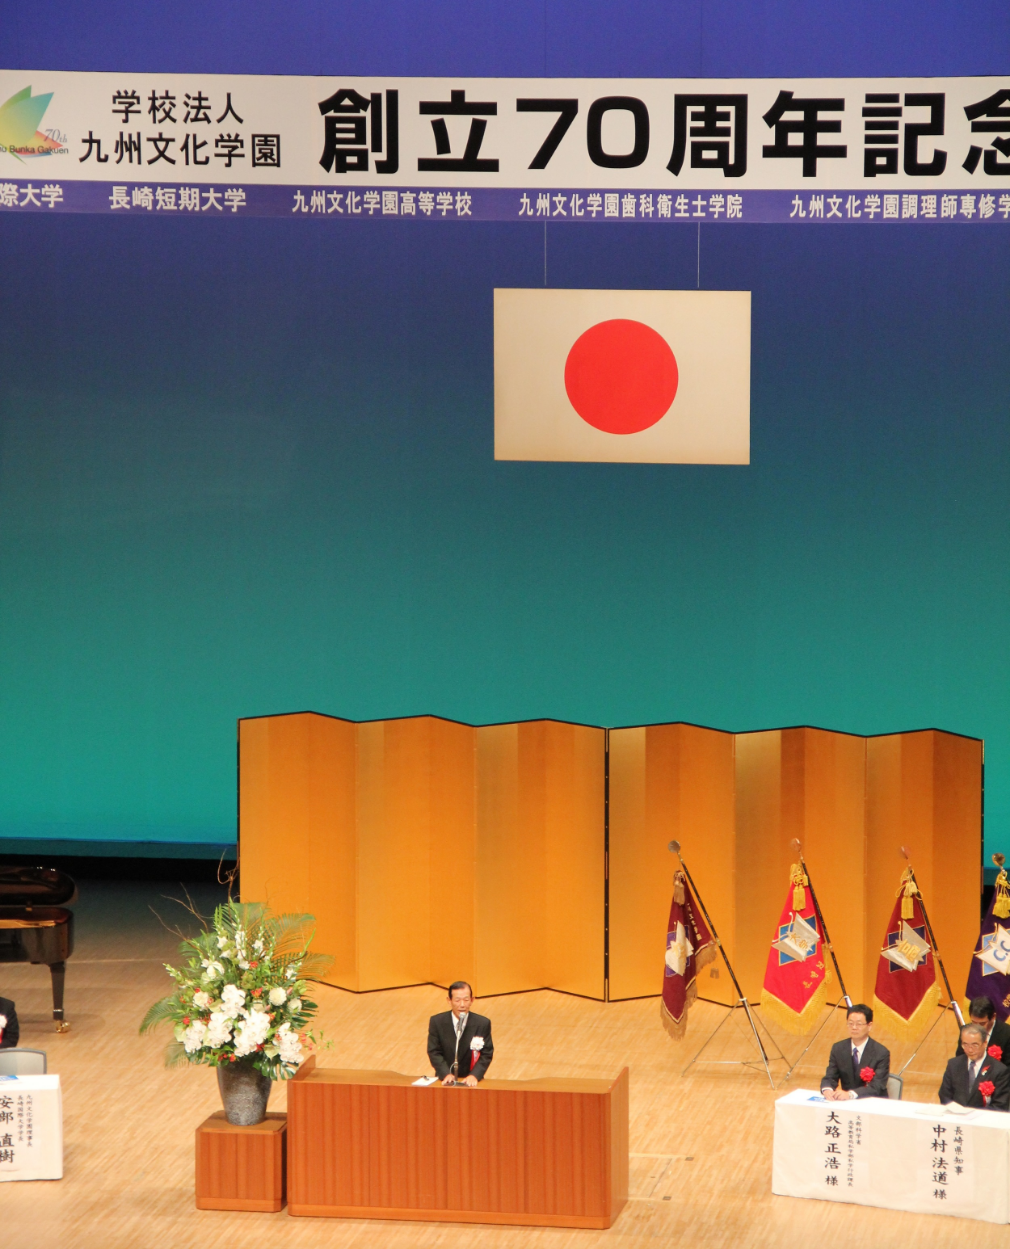 Kyubun 70th Anniversary